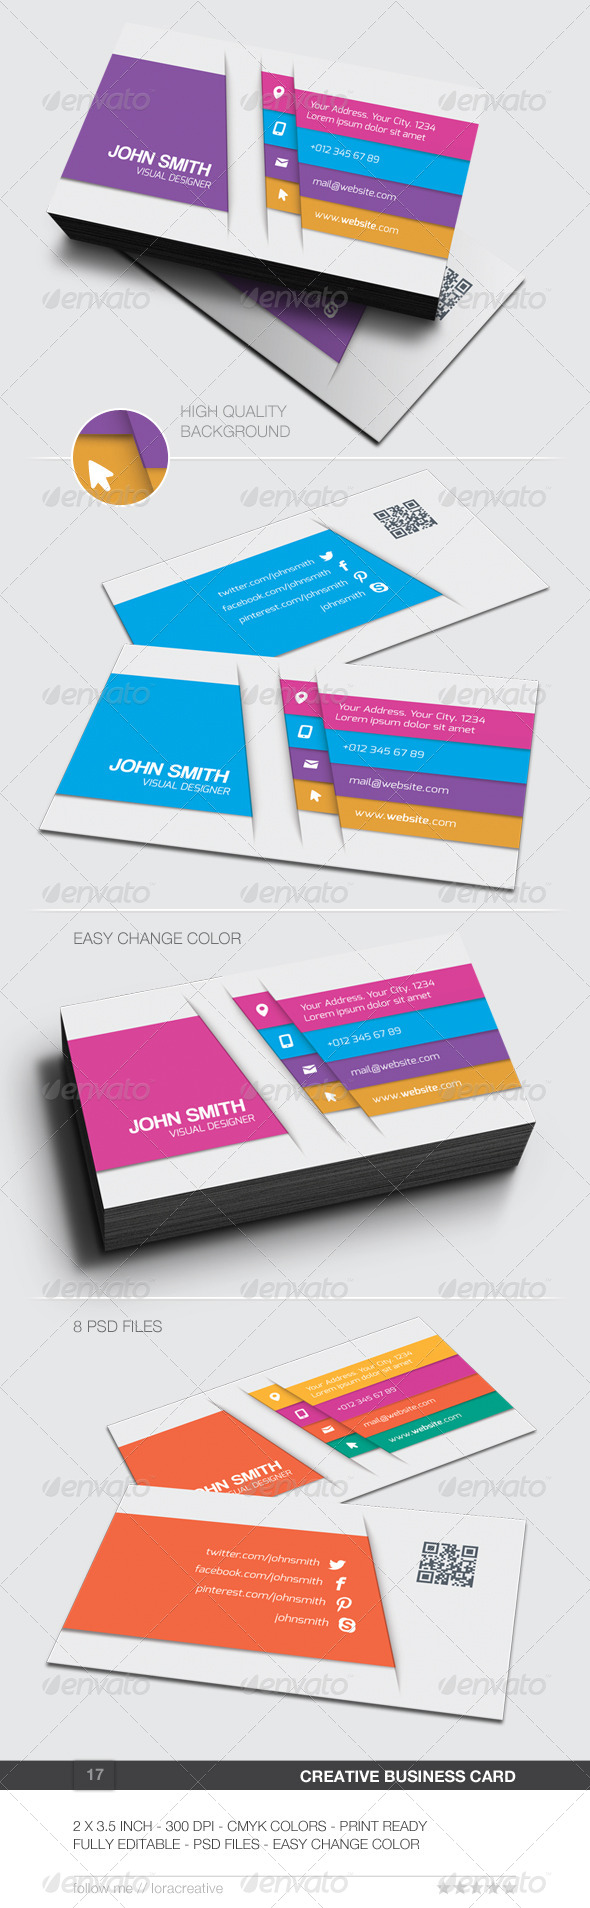 Creative Business Card - 17 - Creative Business Cards